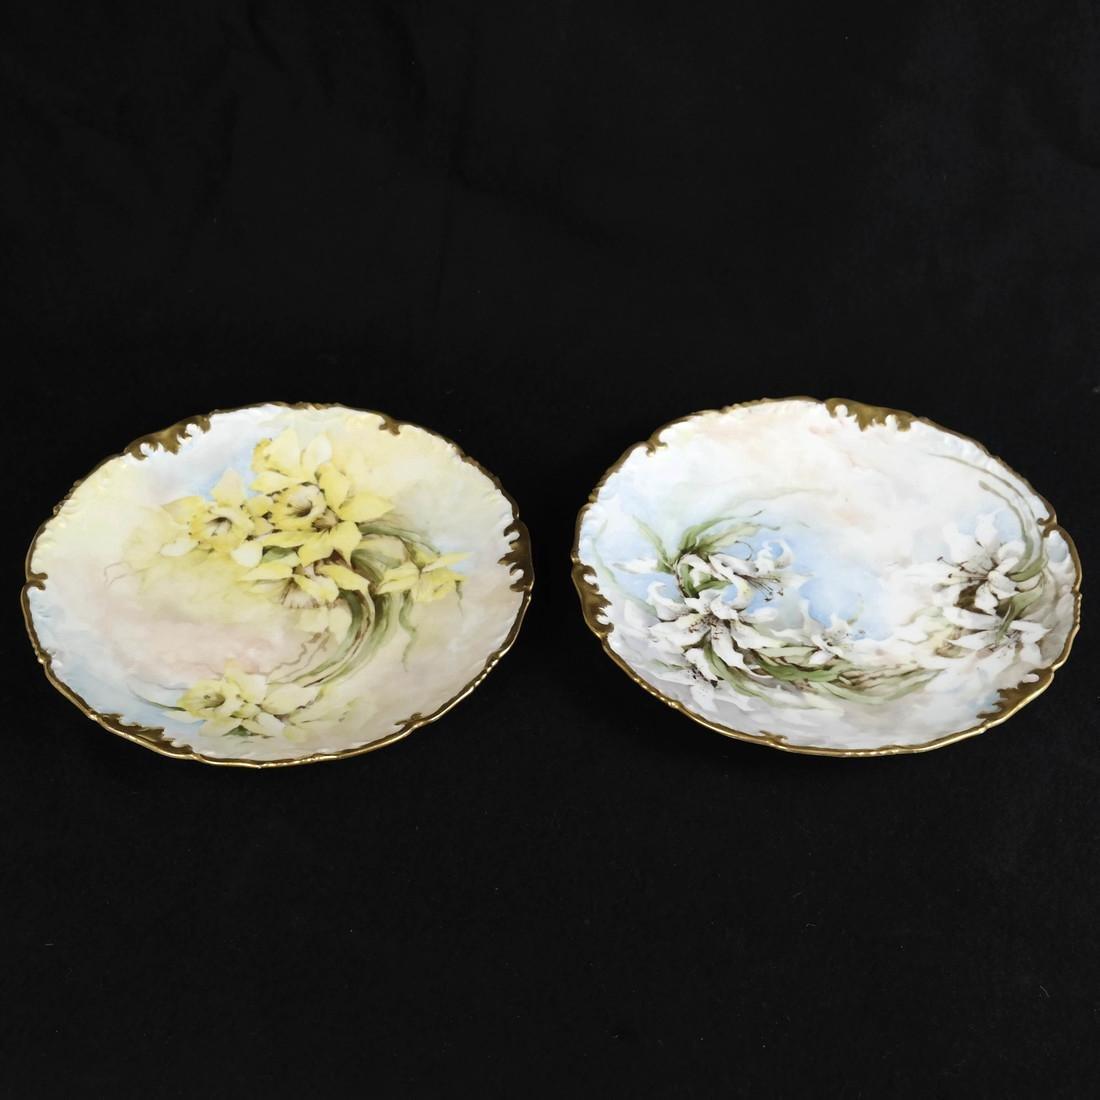 Pair of Limoges Porcelain Plates